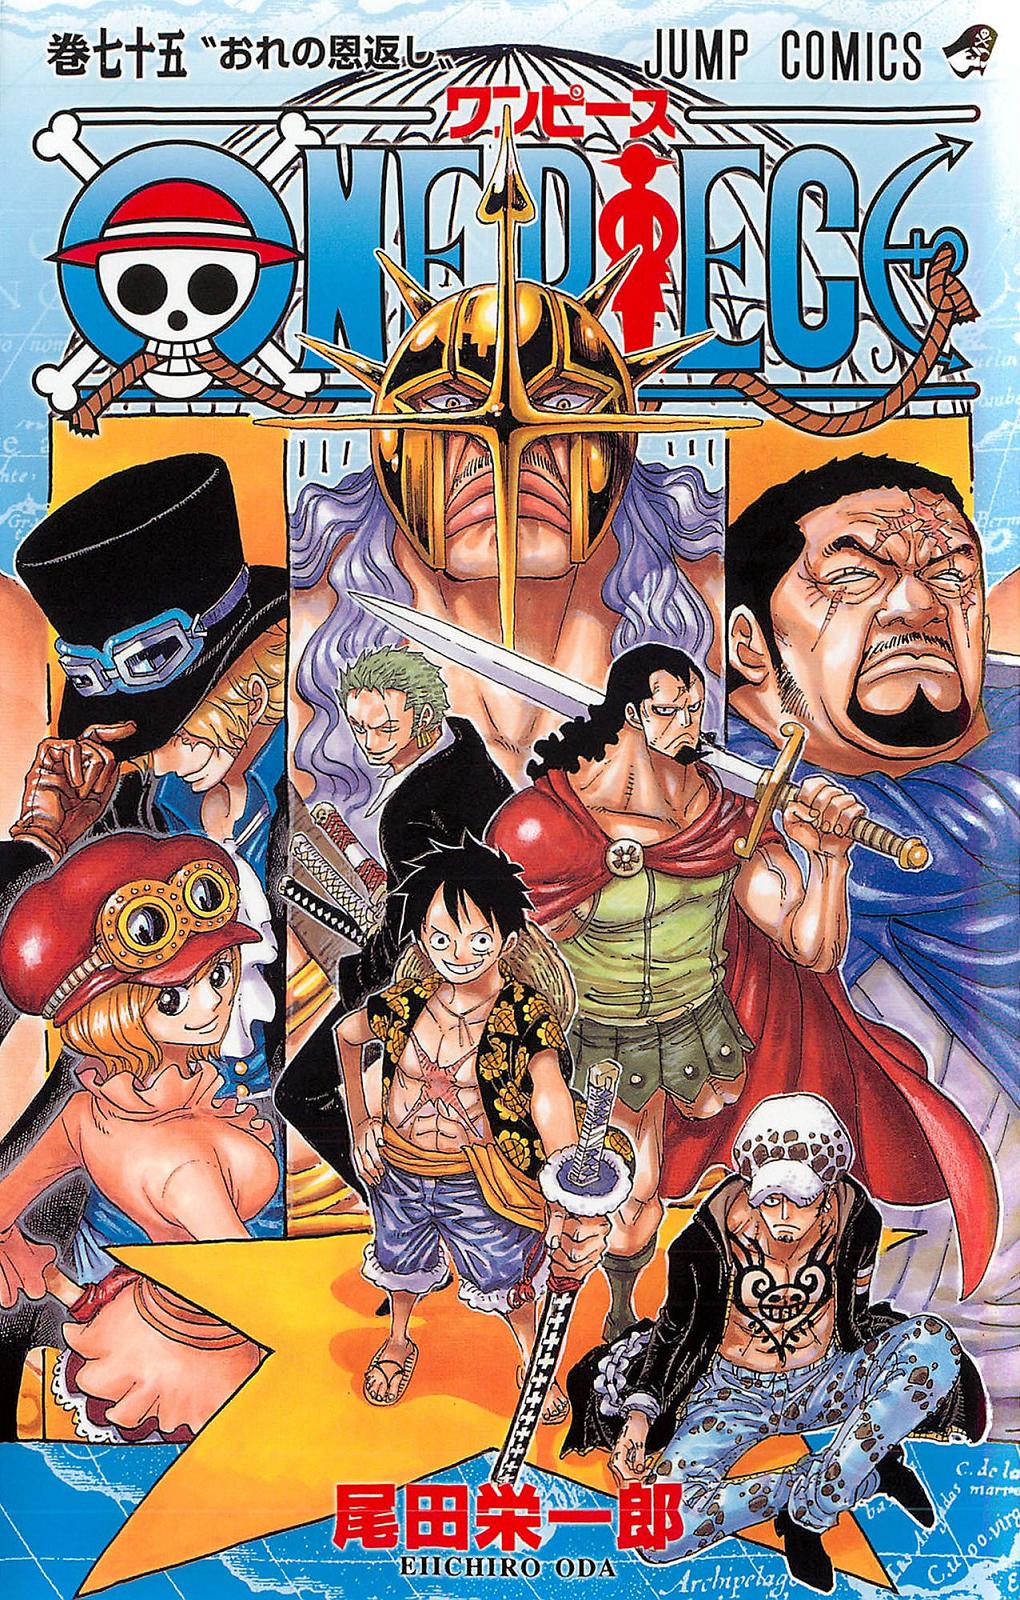 One Piece Encyclopedia One Piece Manga One Piece Comic One Piece Chapter